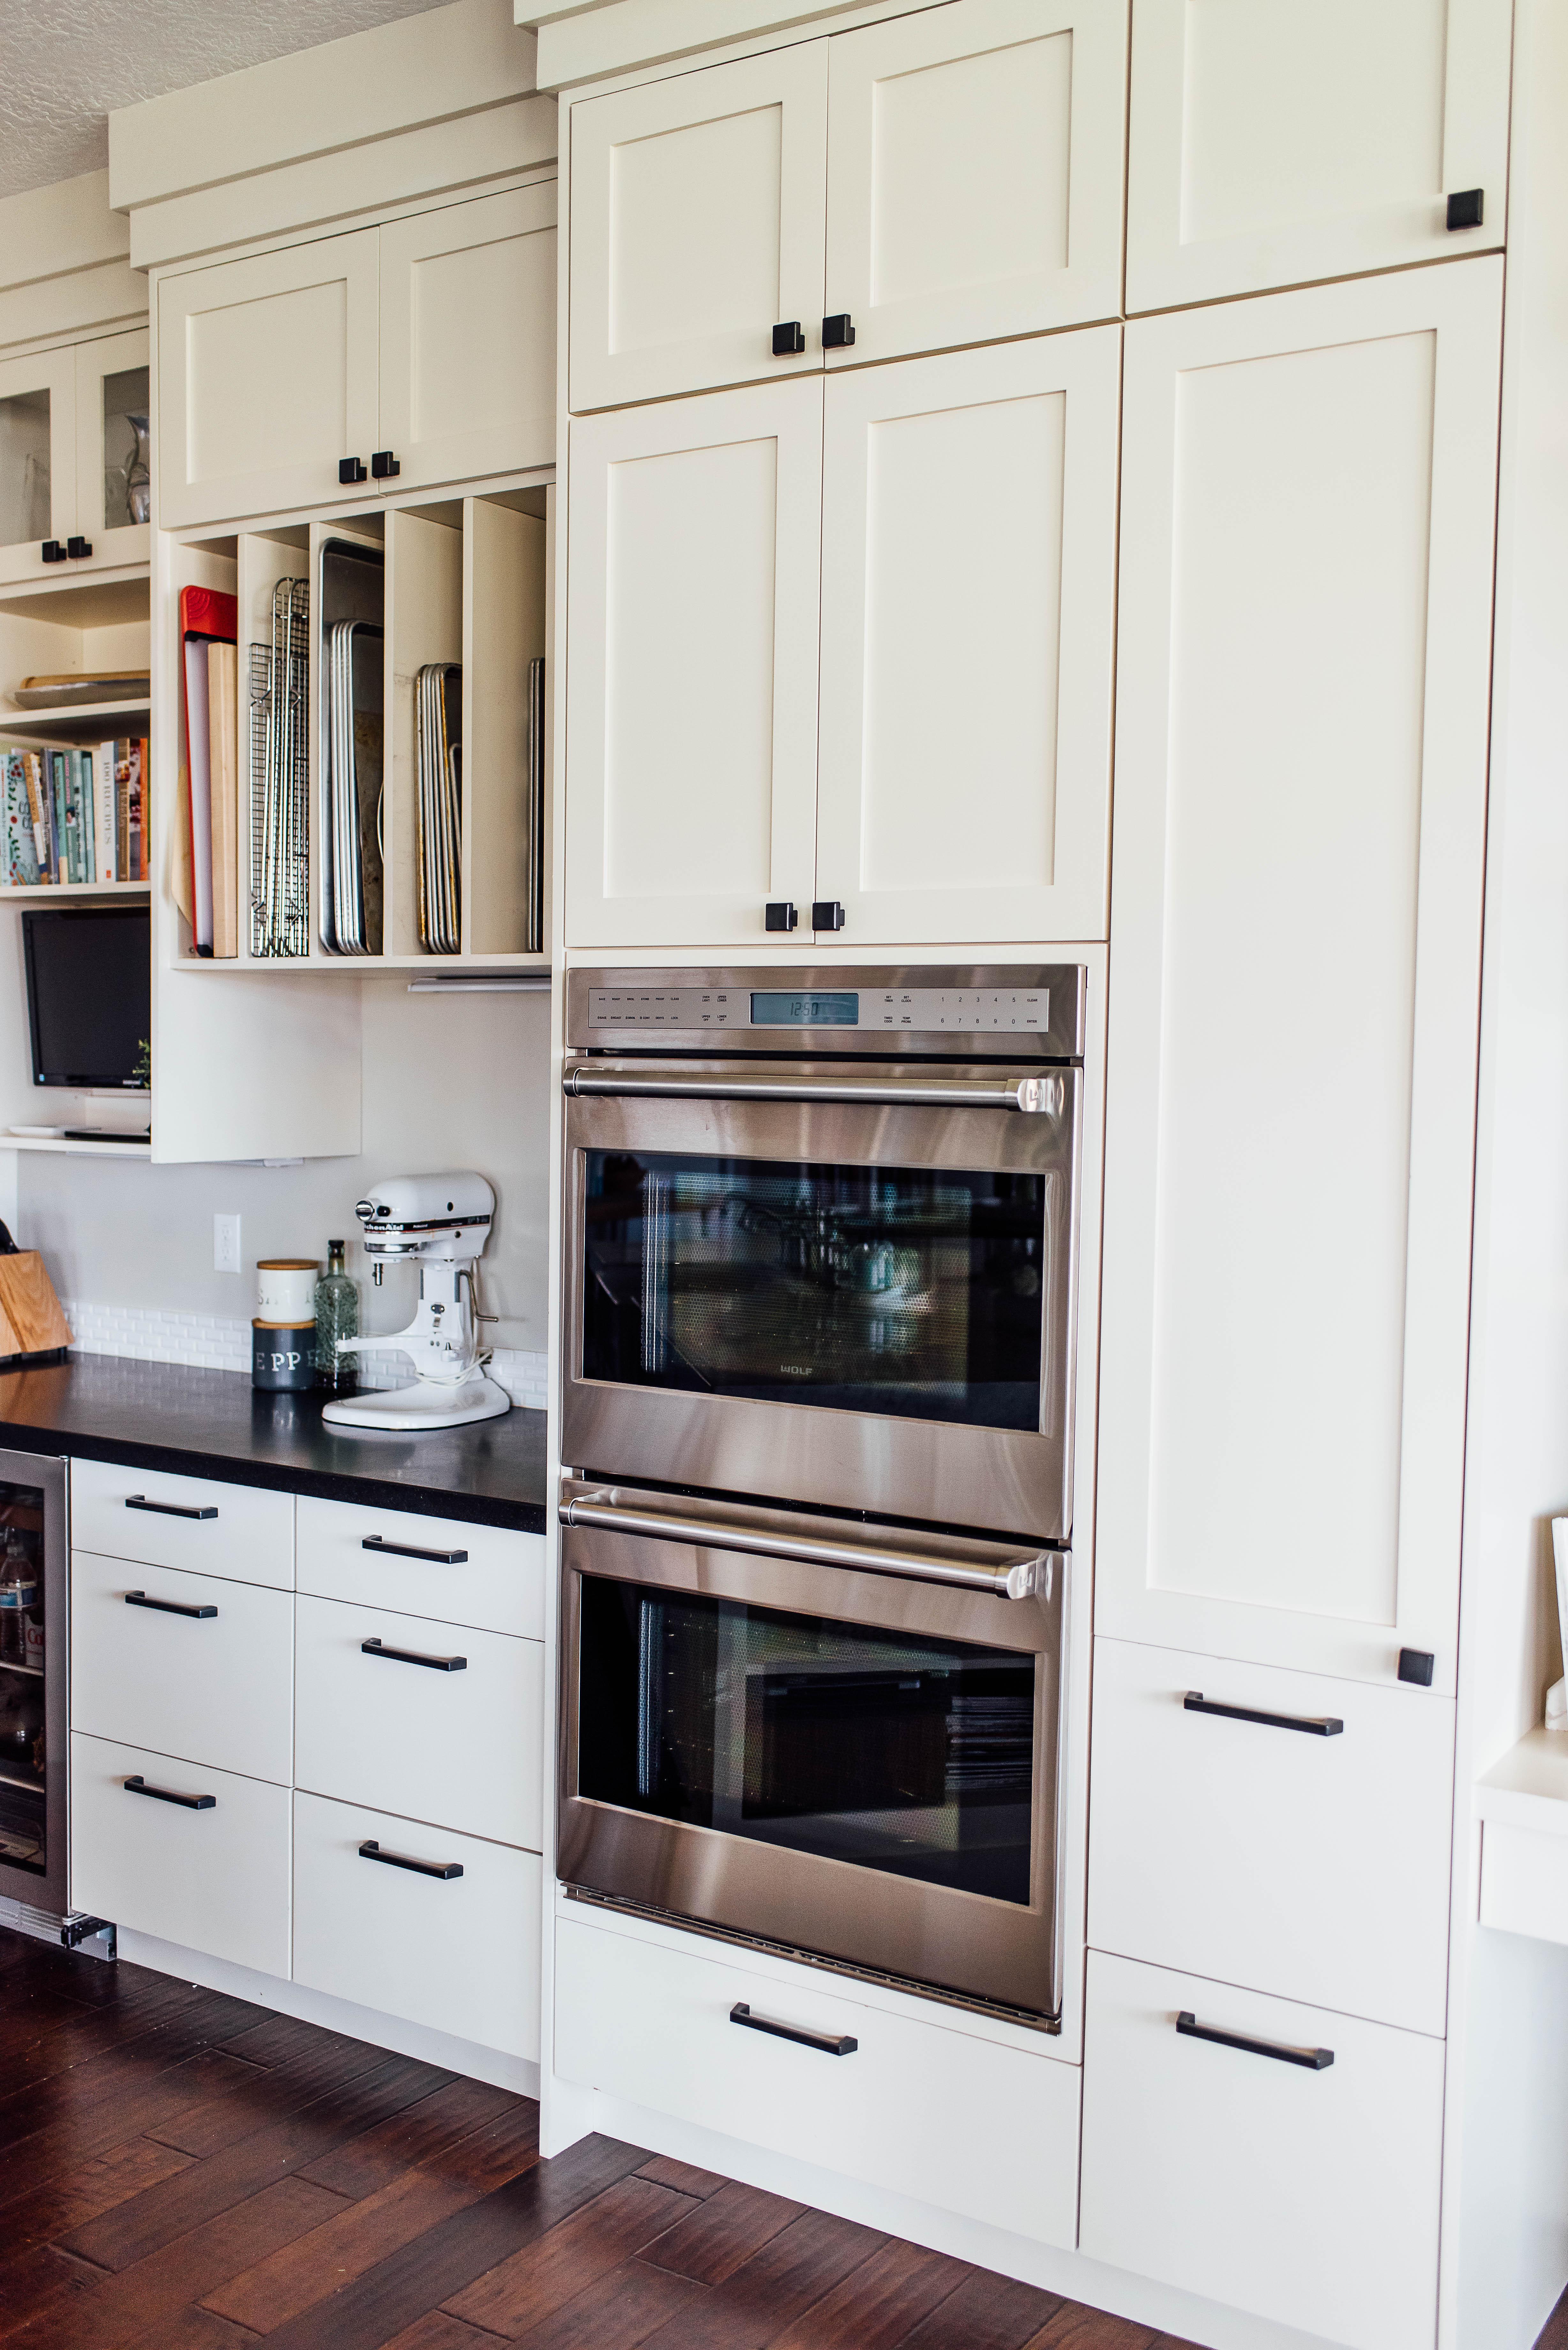 DSC_4806   A Bountiful Kitchen